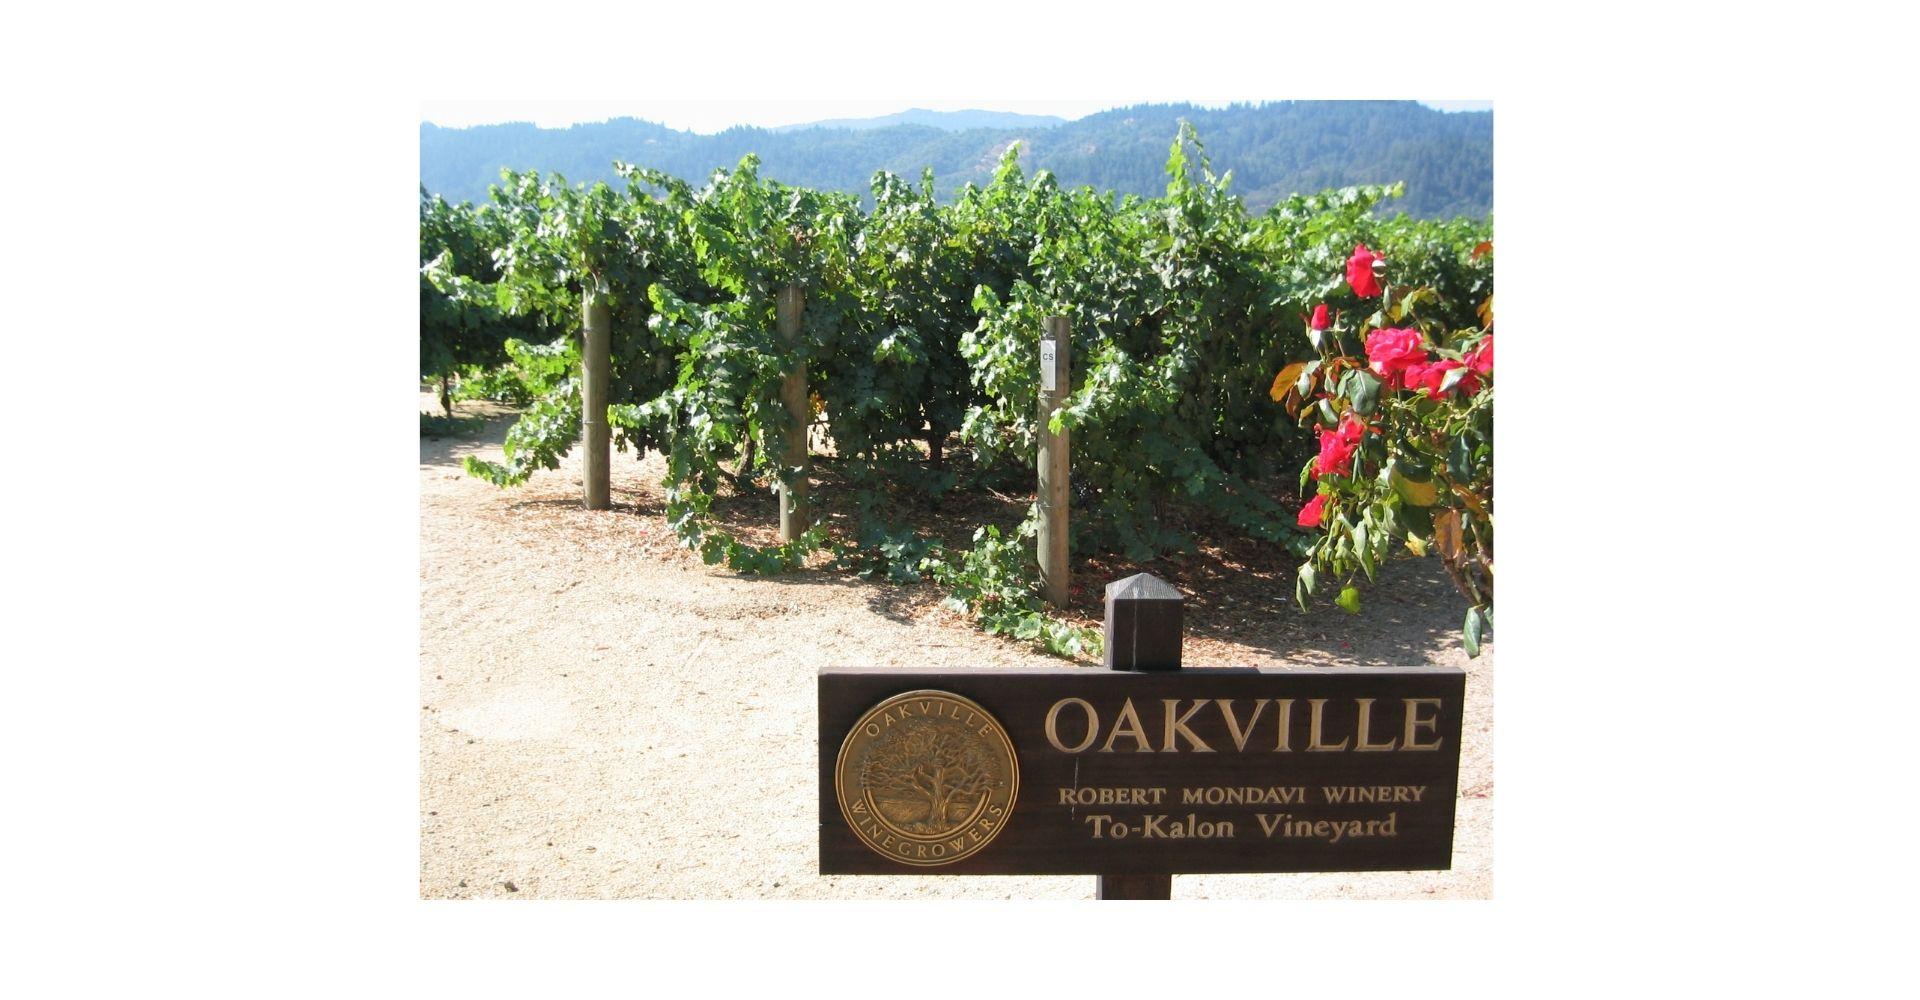 A photo of Mondavi's To Kalon vineyard